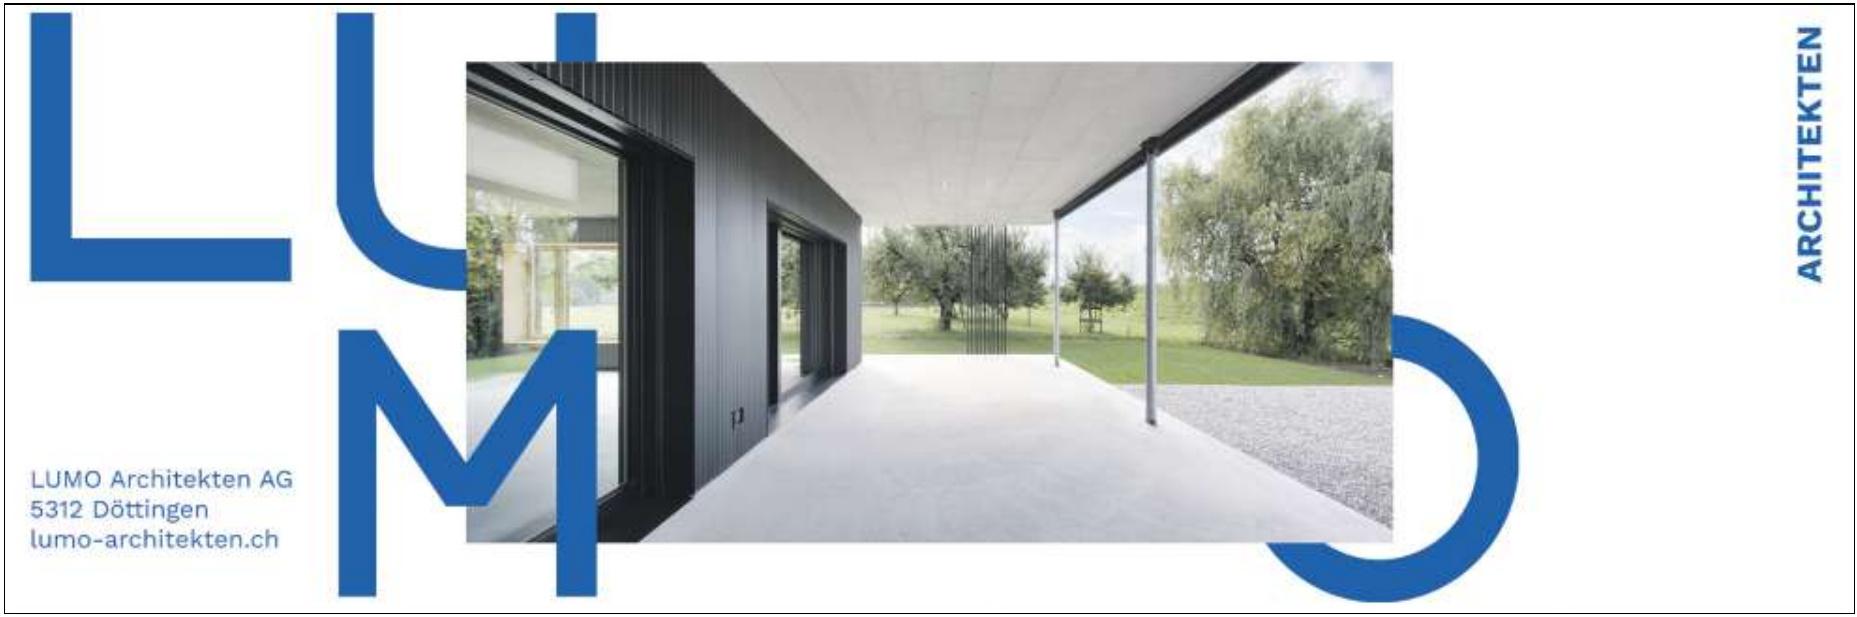 Lumo Architekten AG